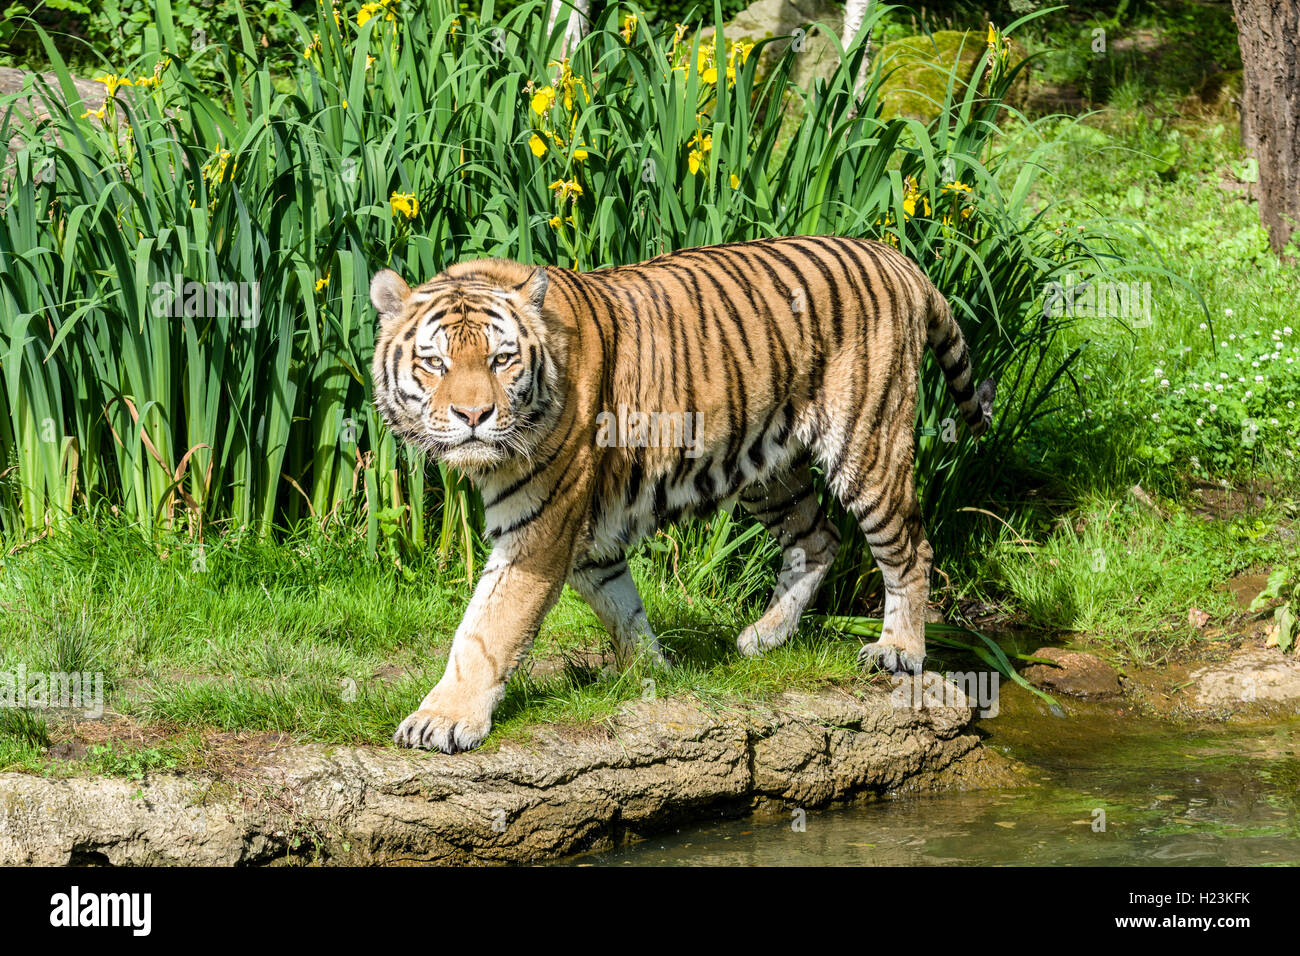 Amur Tiger (Panthera tigris altaica), walking along a waterhole, captive, Leipzig, Saxony, Germany - Stock Image